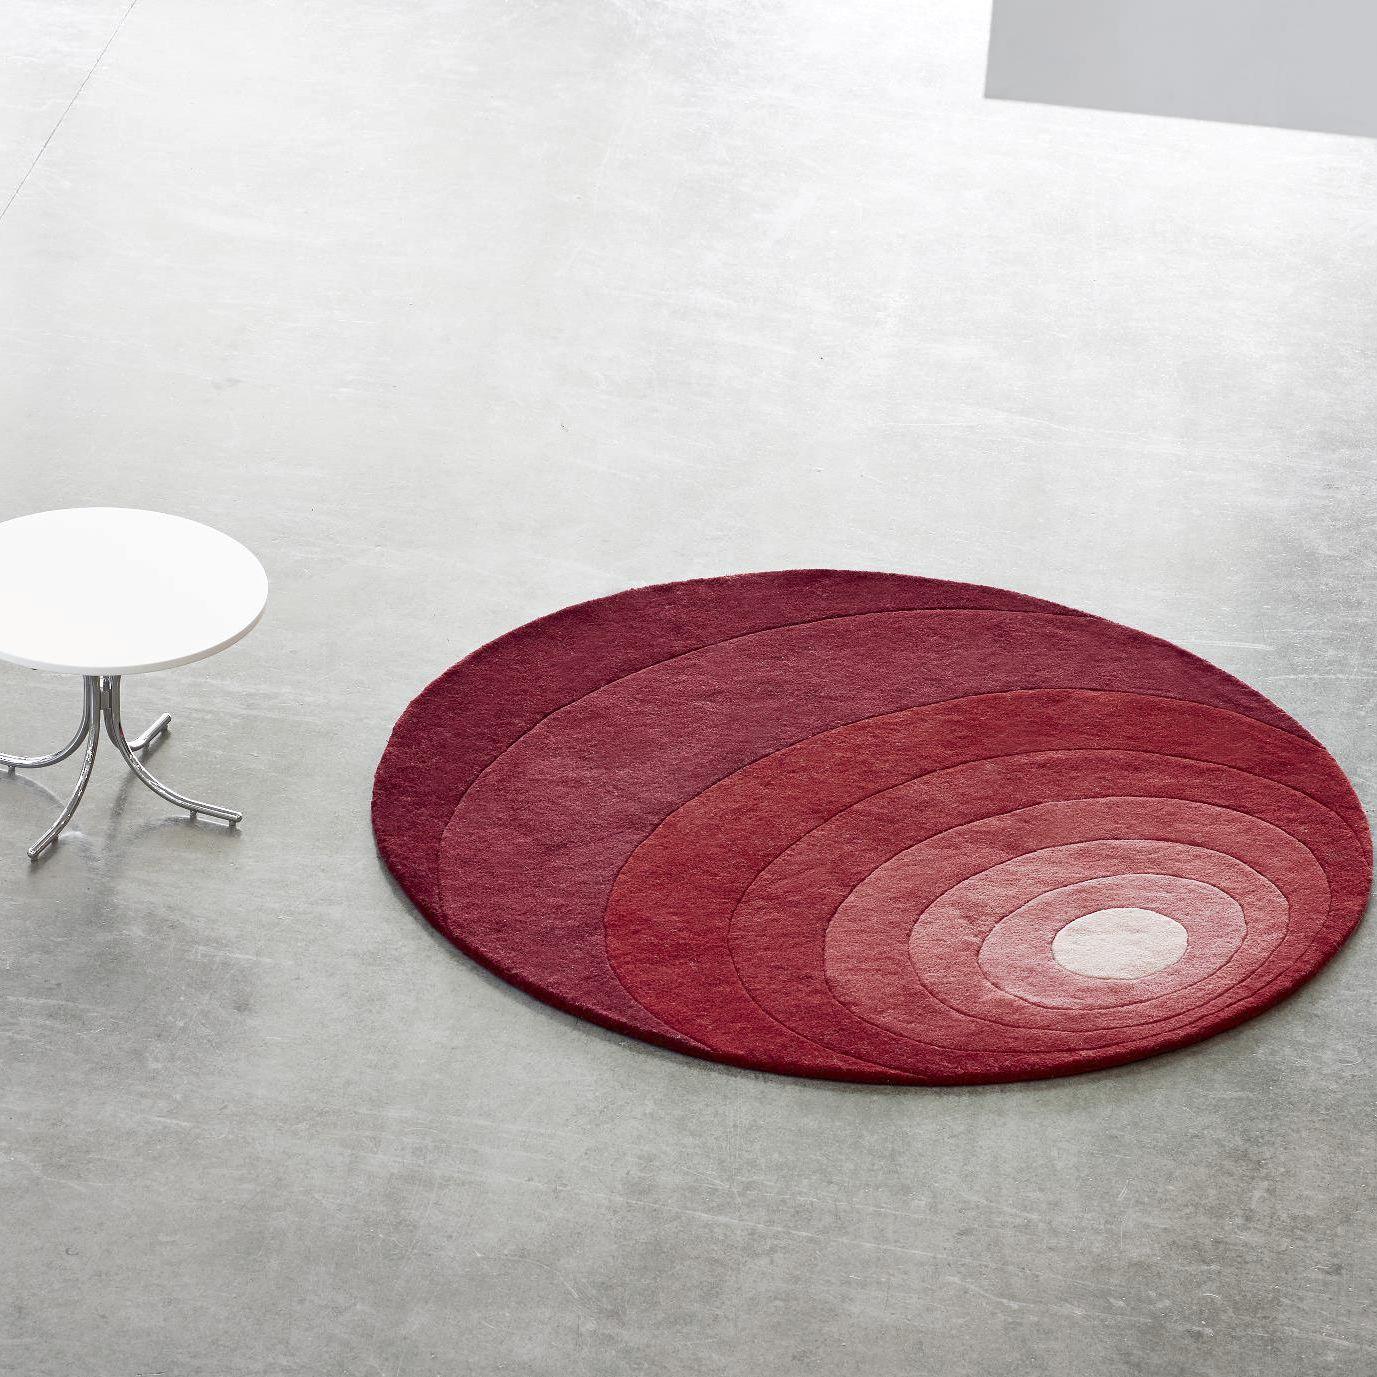 Tappeto moderno / geometrico / in lana / rotondo - LUNA - VerPan